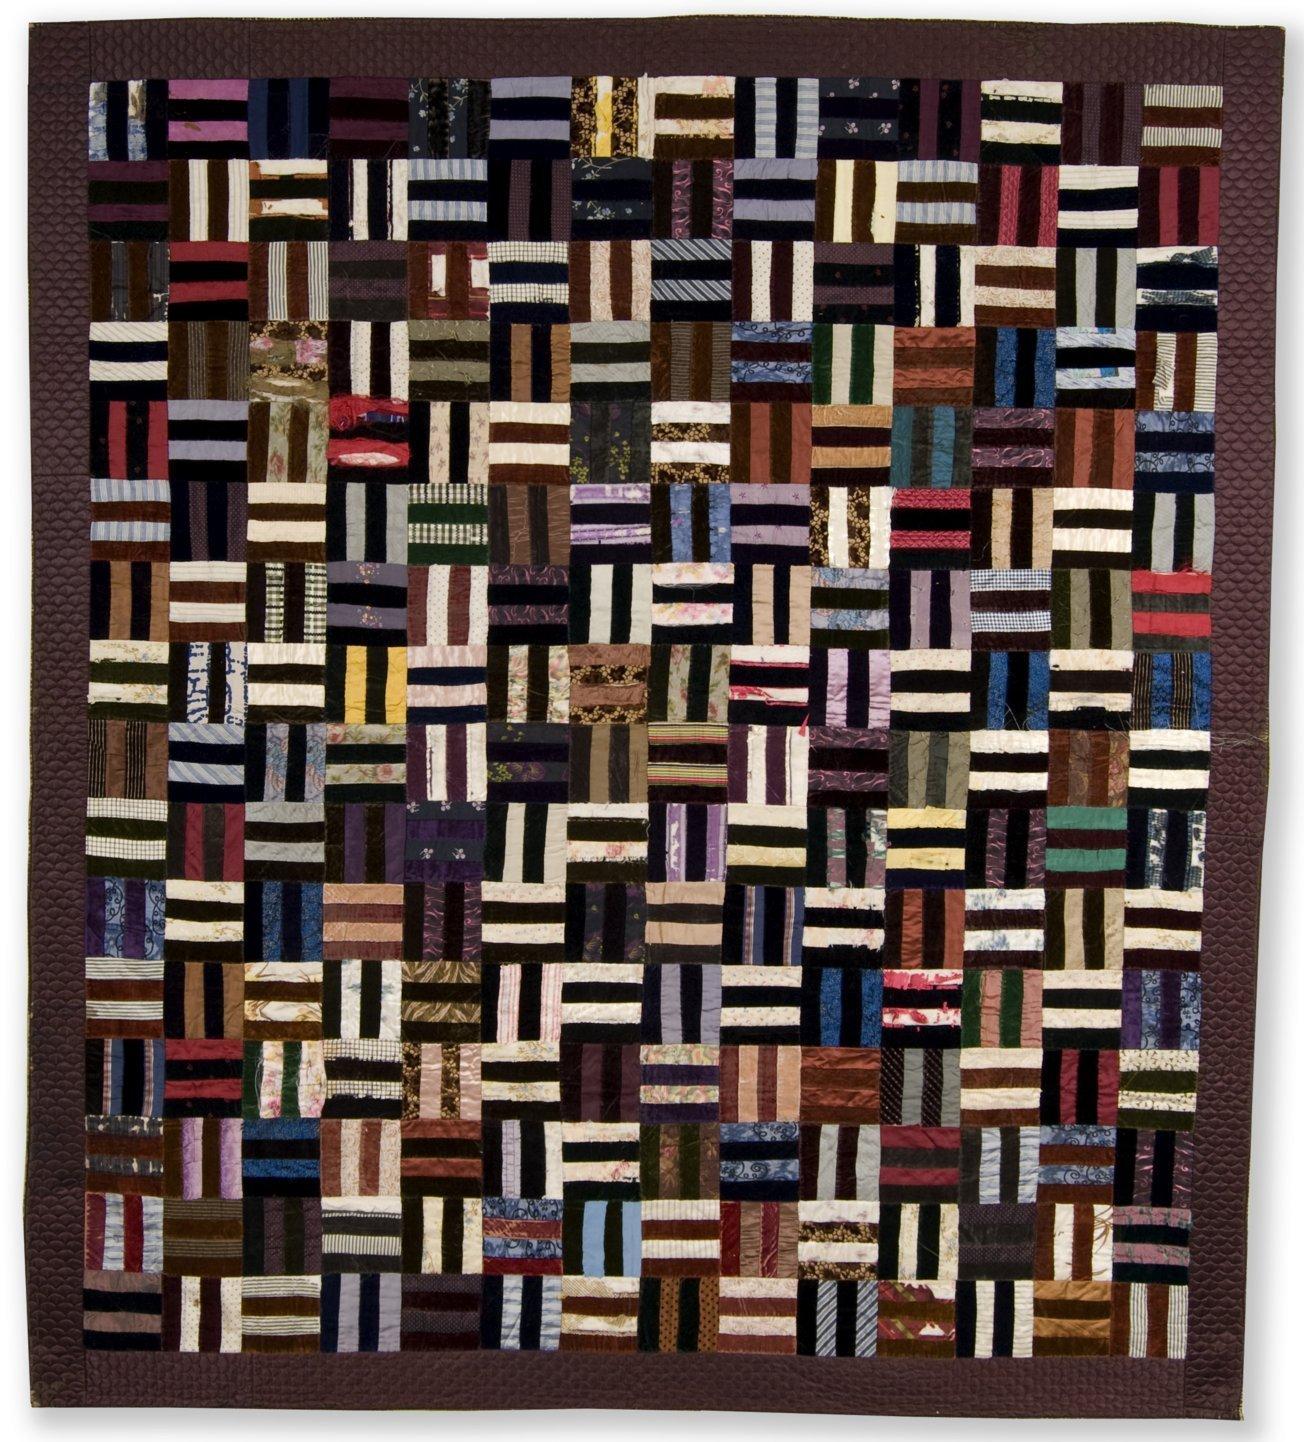 Roman Stripe or Rail Fence quilt